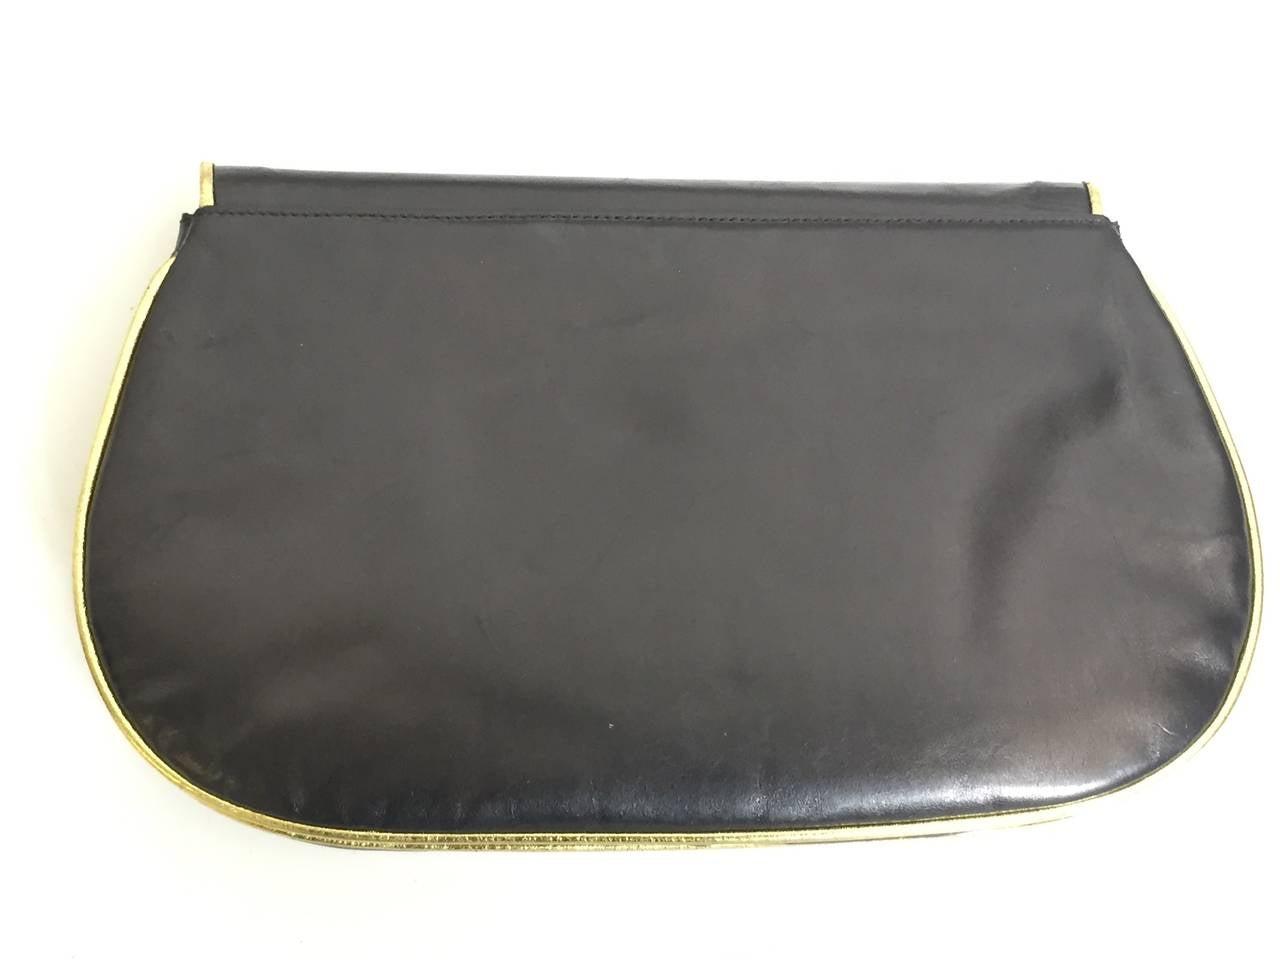 Barbara Bolan Black Leather Paisley Shoulder and/or Clutch Handbag, 1980s  In Good Condition For Sale In Atlanta, GA